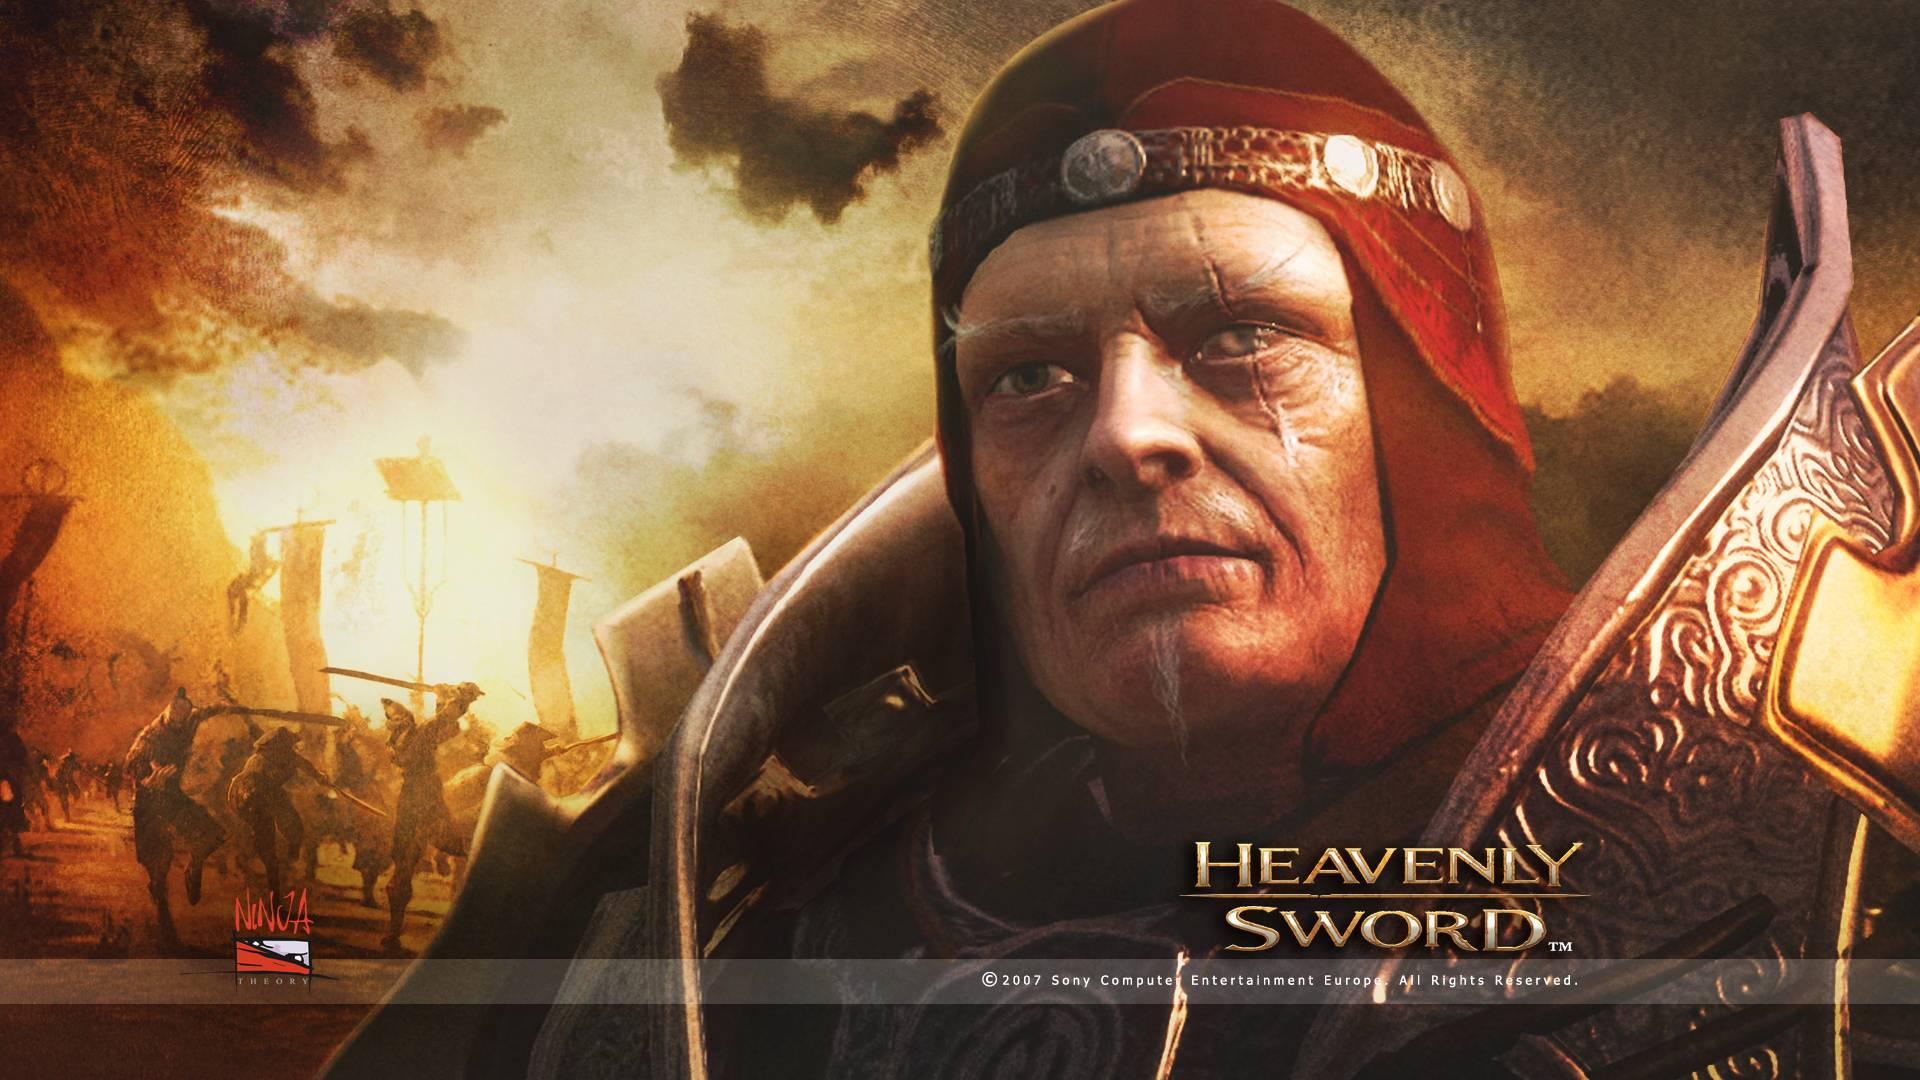 Heavenly Sword HD Trailer TGS 07 - Freeware - EN - download.chip.eu